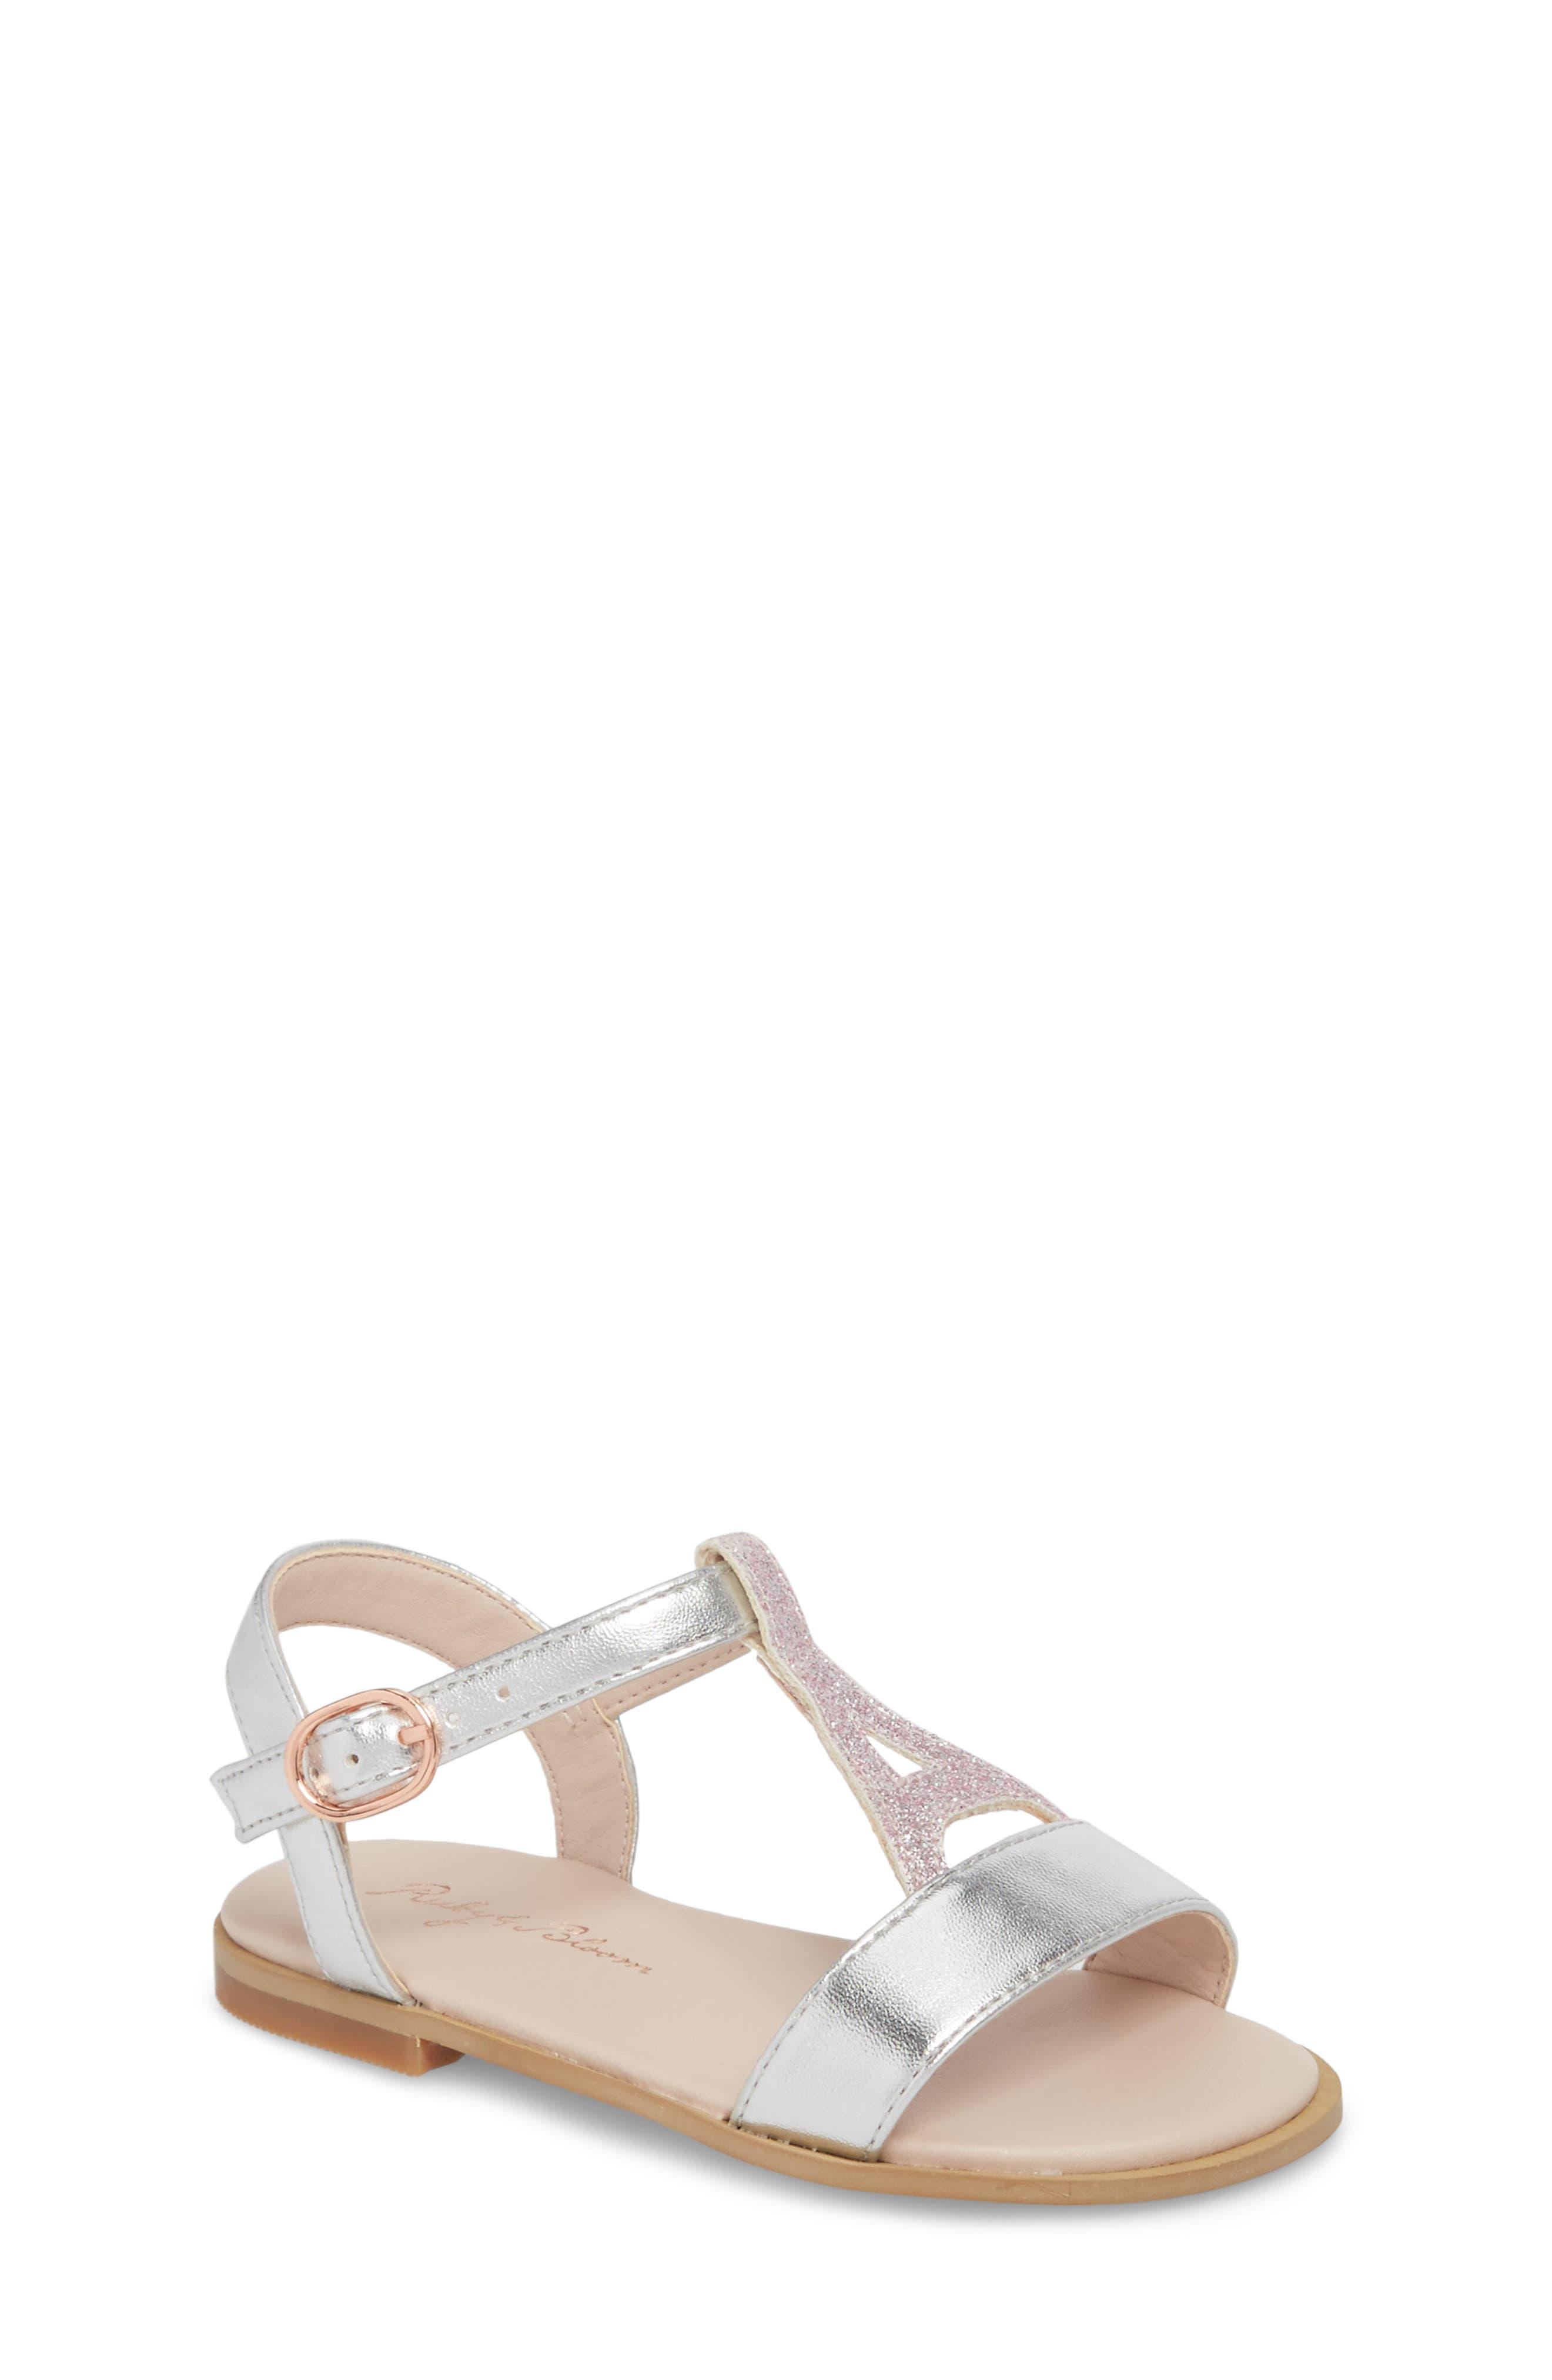 Tegan Glitter T-Strap Sandal,                         Main,                         color, 040